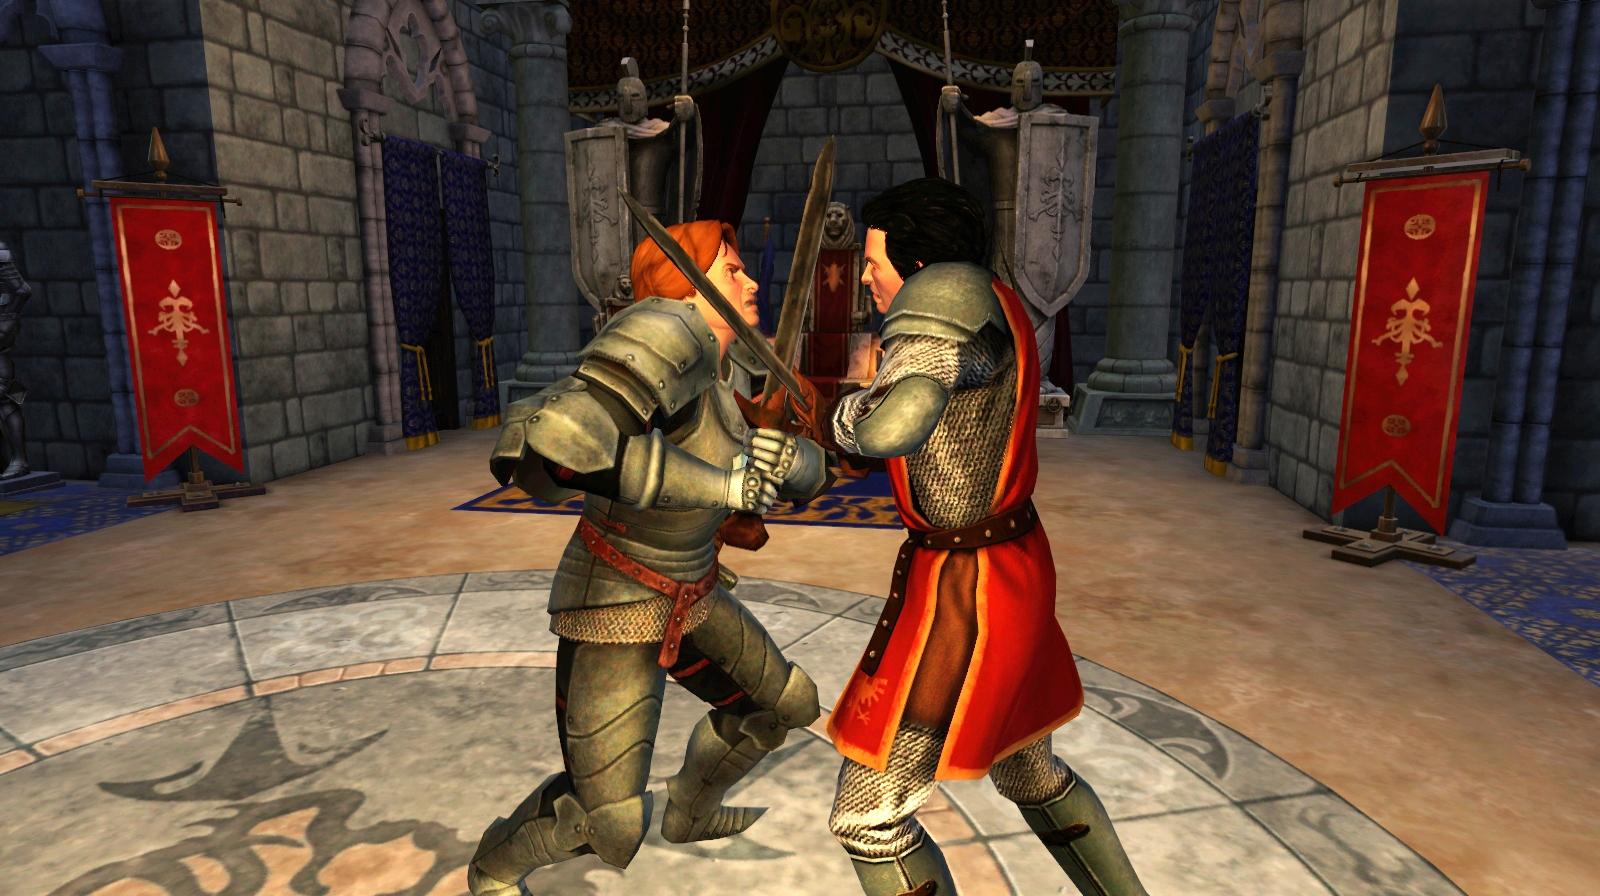 http://1.bp.blogspot.com/-eWQ0qW7CSQw/Tmes7un7apI/AAAAAAAADU0/ha21uMVmp68/s1600/TheSimsMedieval_swordfight.jpg